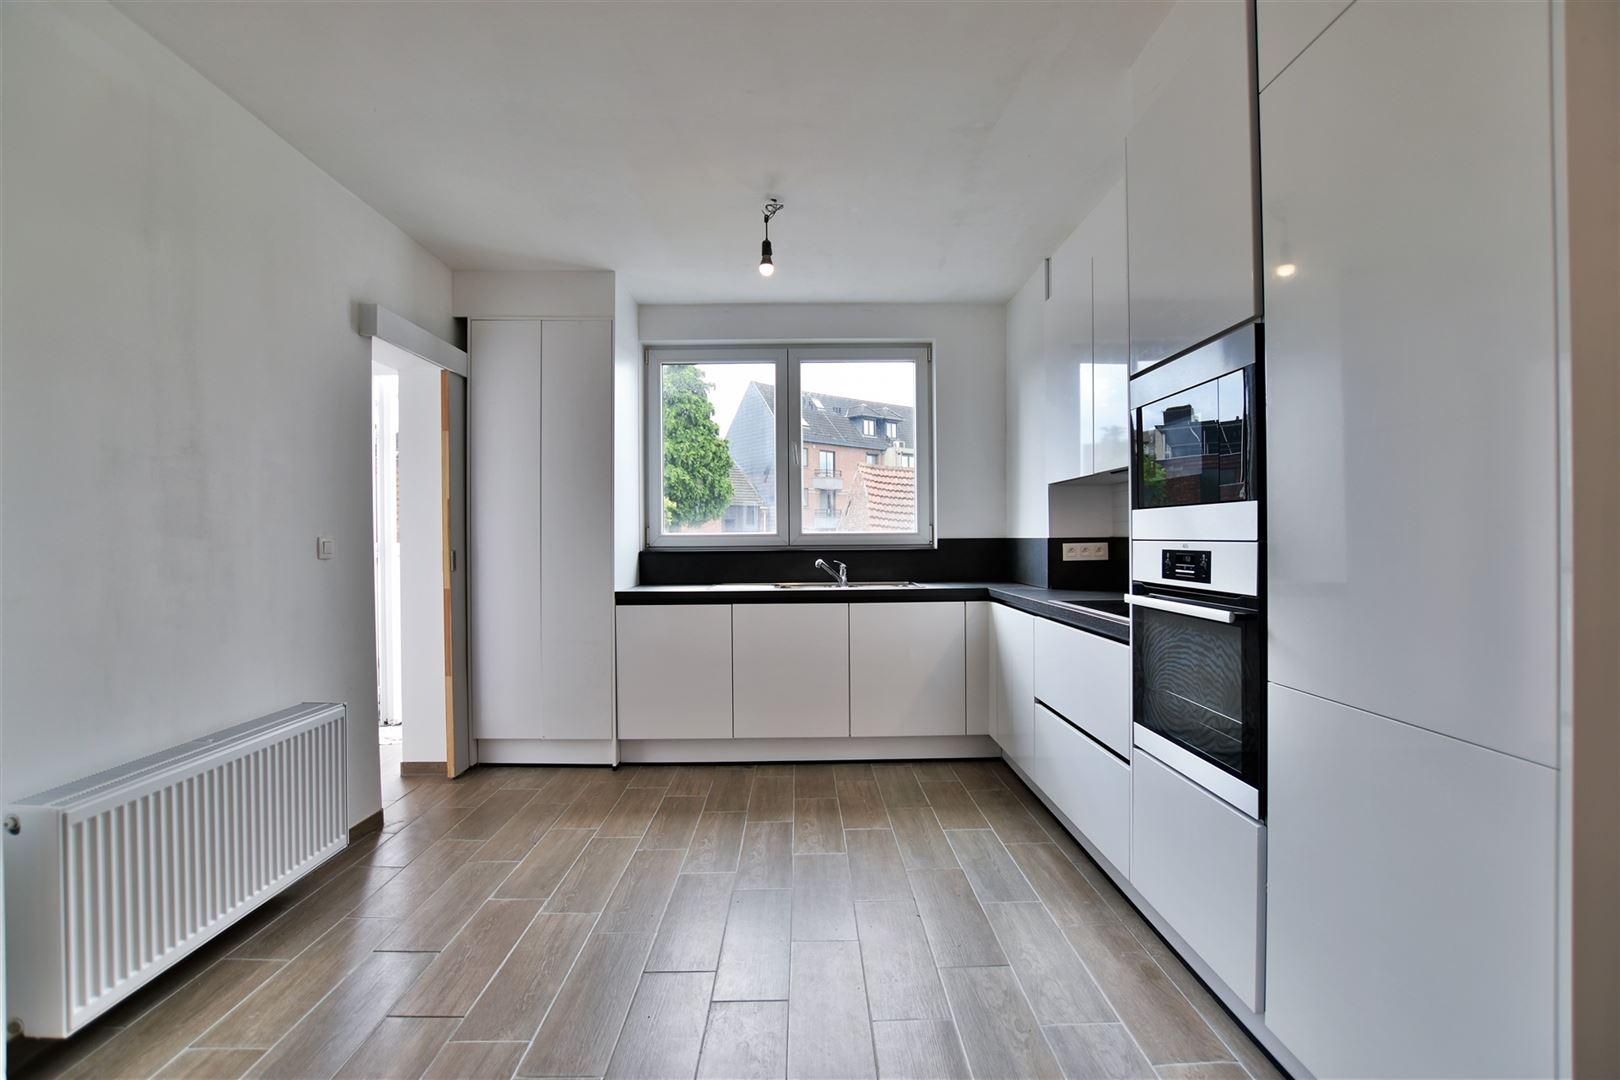 Foto 2 : Appartement te 9200 DENDERMONDE (België) - Prijs € 299.000